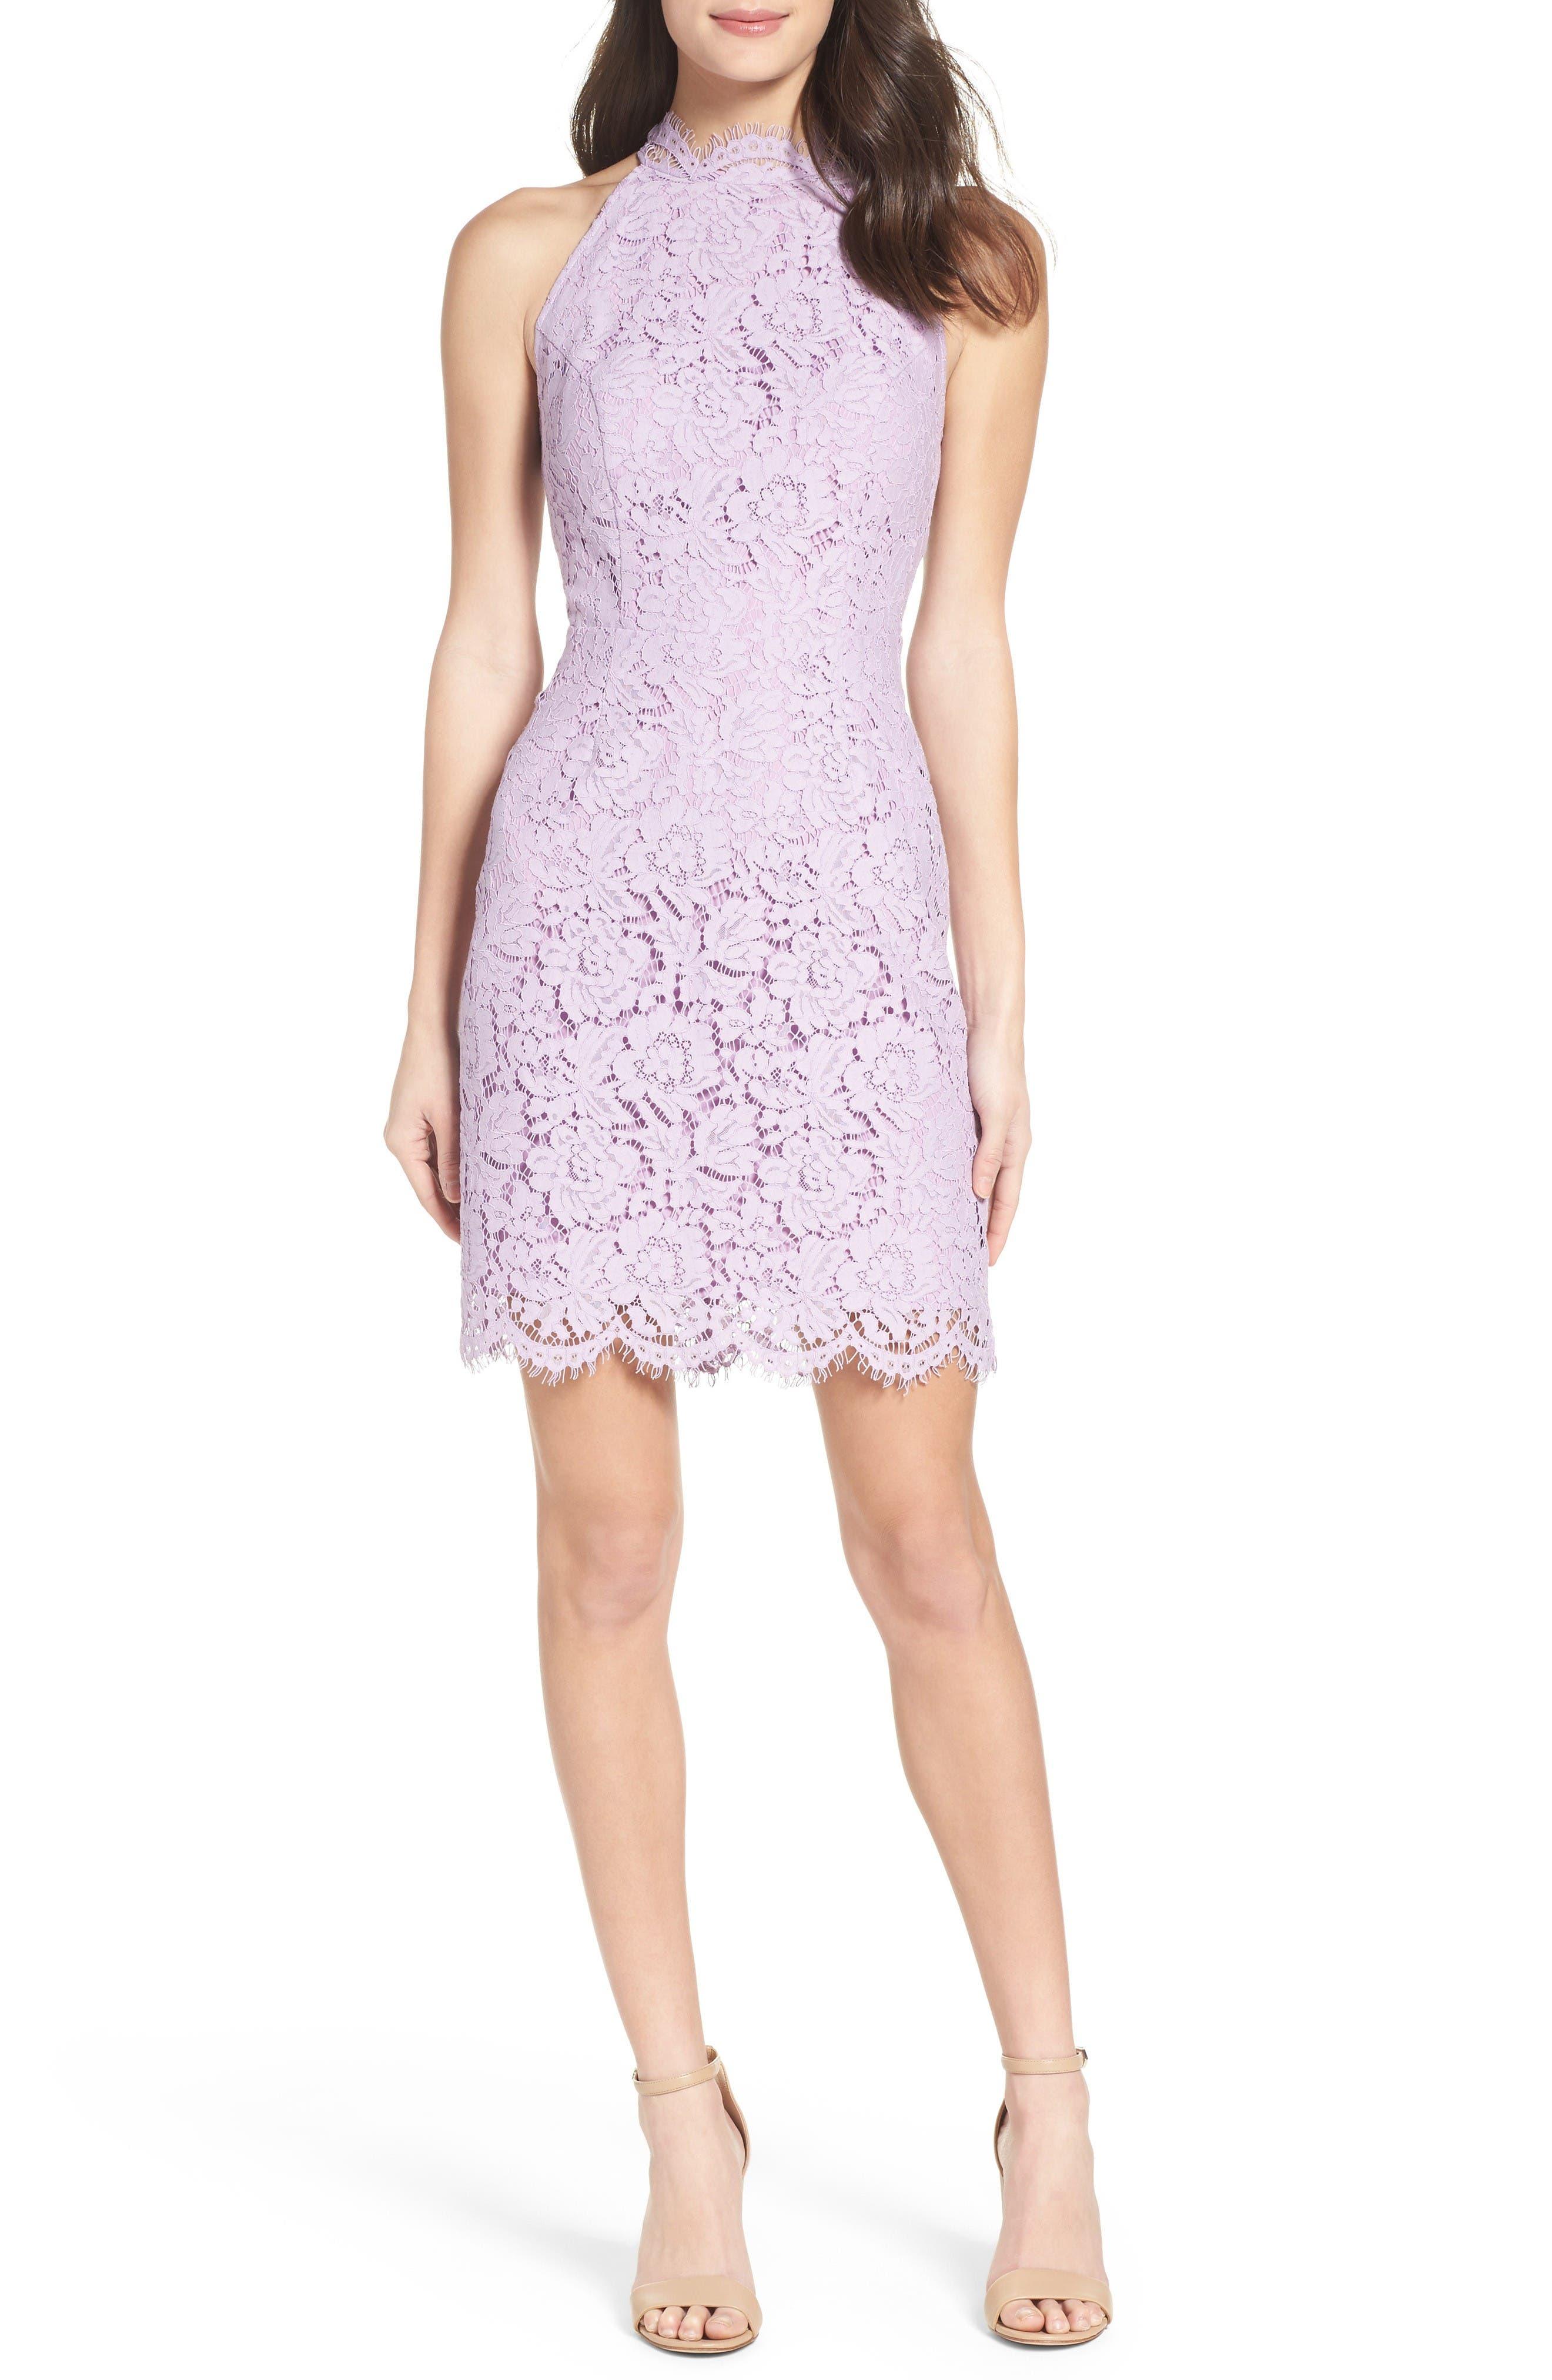 'Cara' High Neck Lace Dress,                             Main thumbnail 1, color,                             Lavender